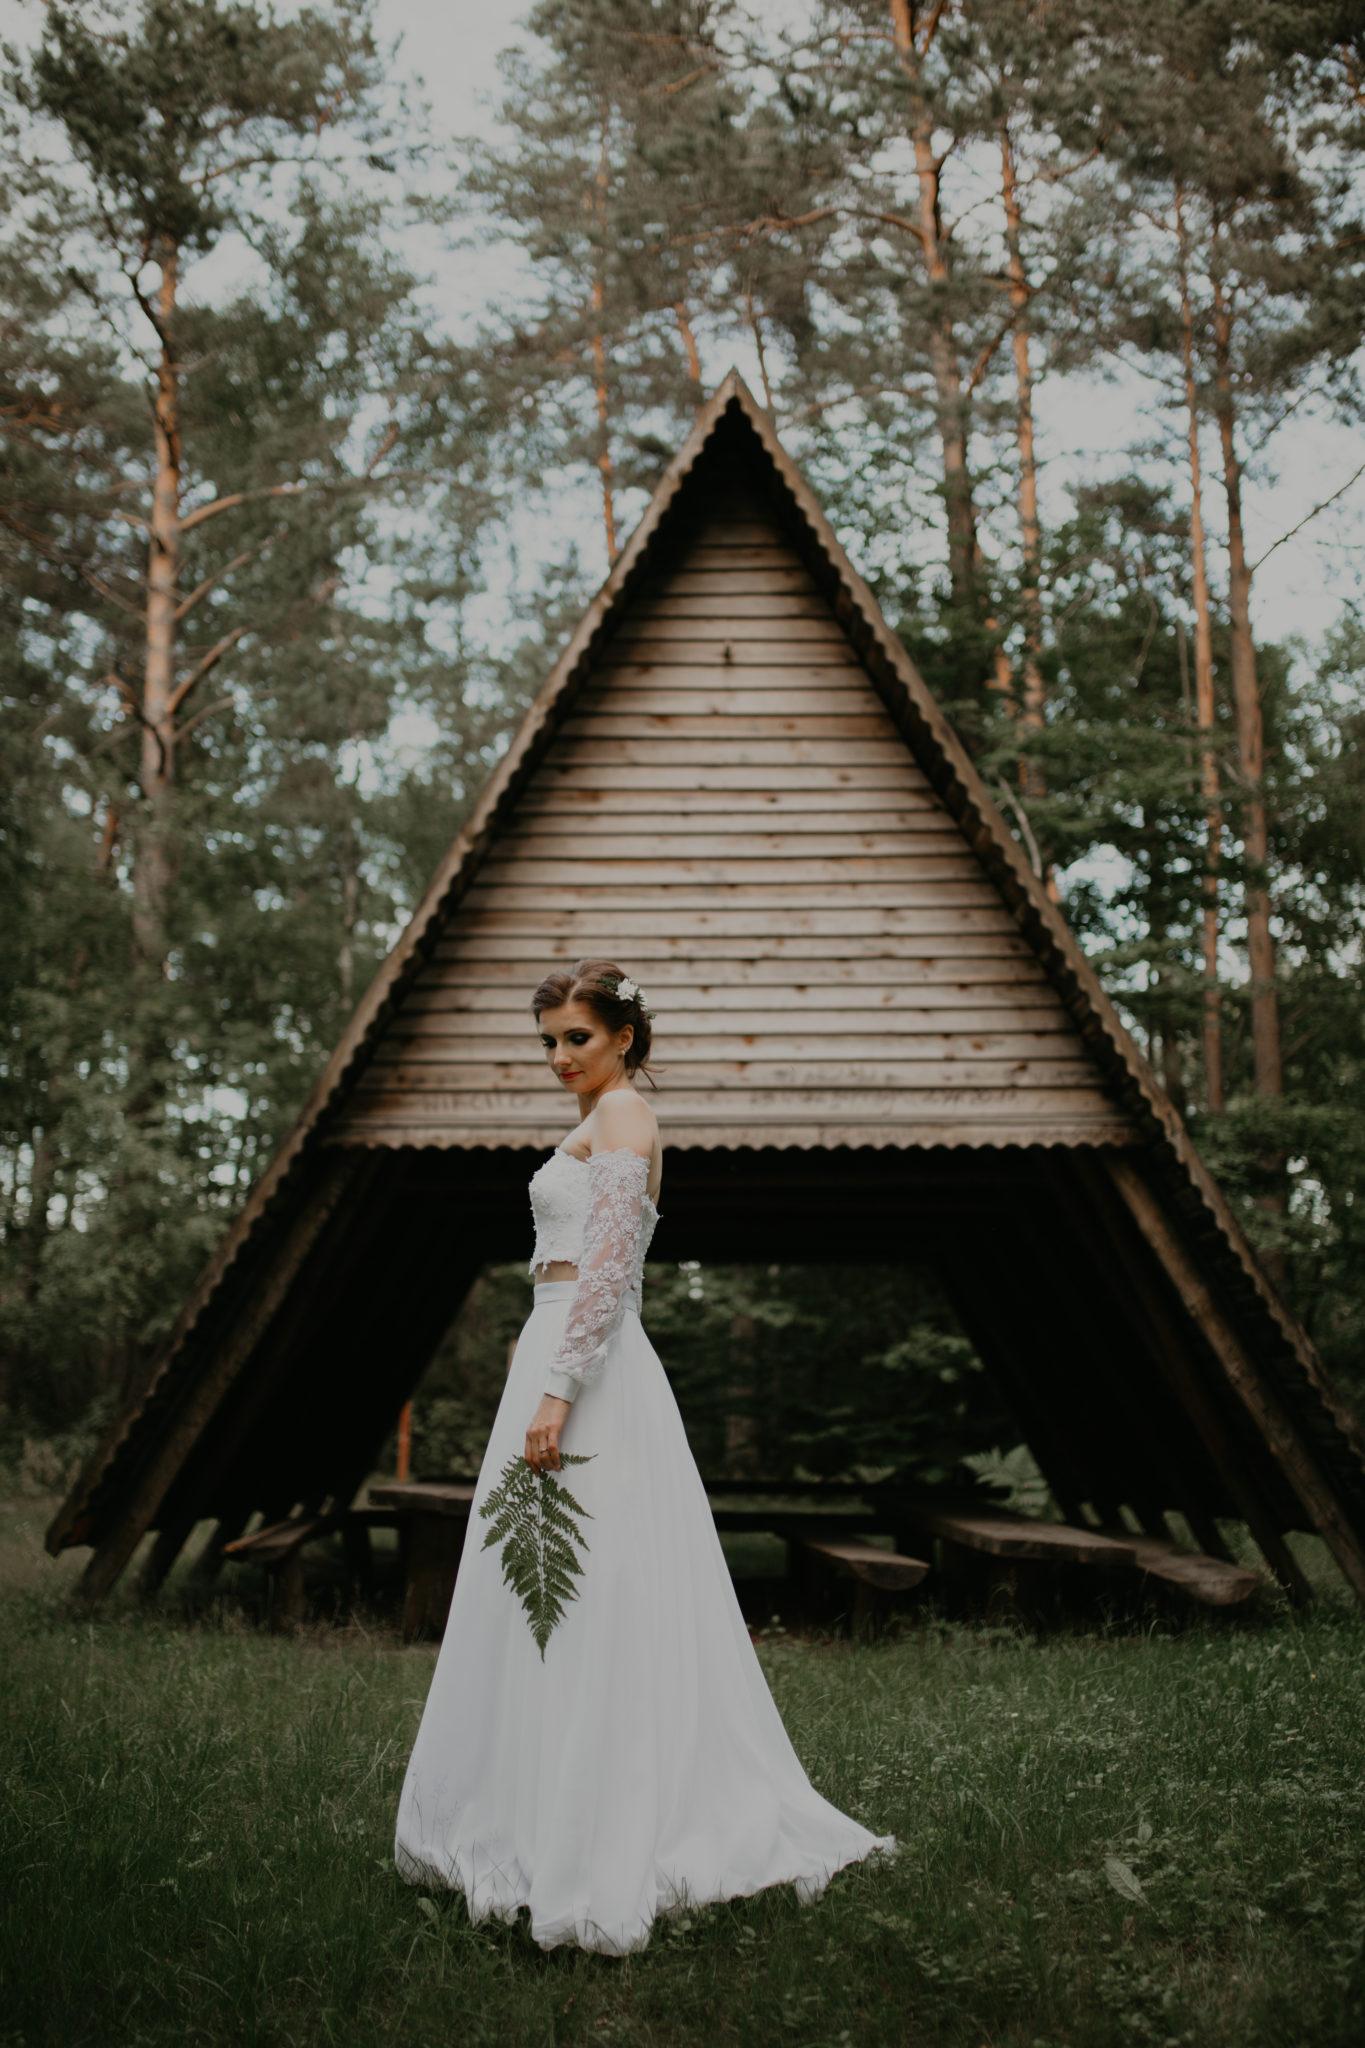 gosia i kubaplener 14 1 - fotografiagk Fotografia ślubna RK wedding